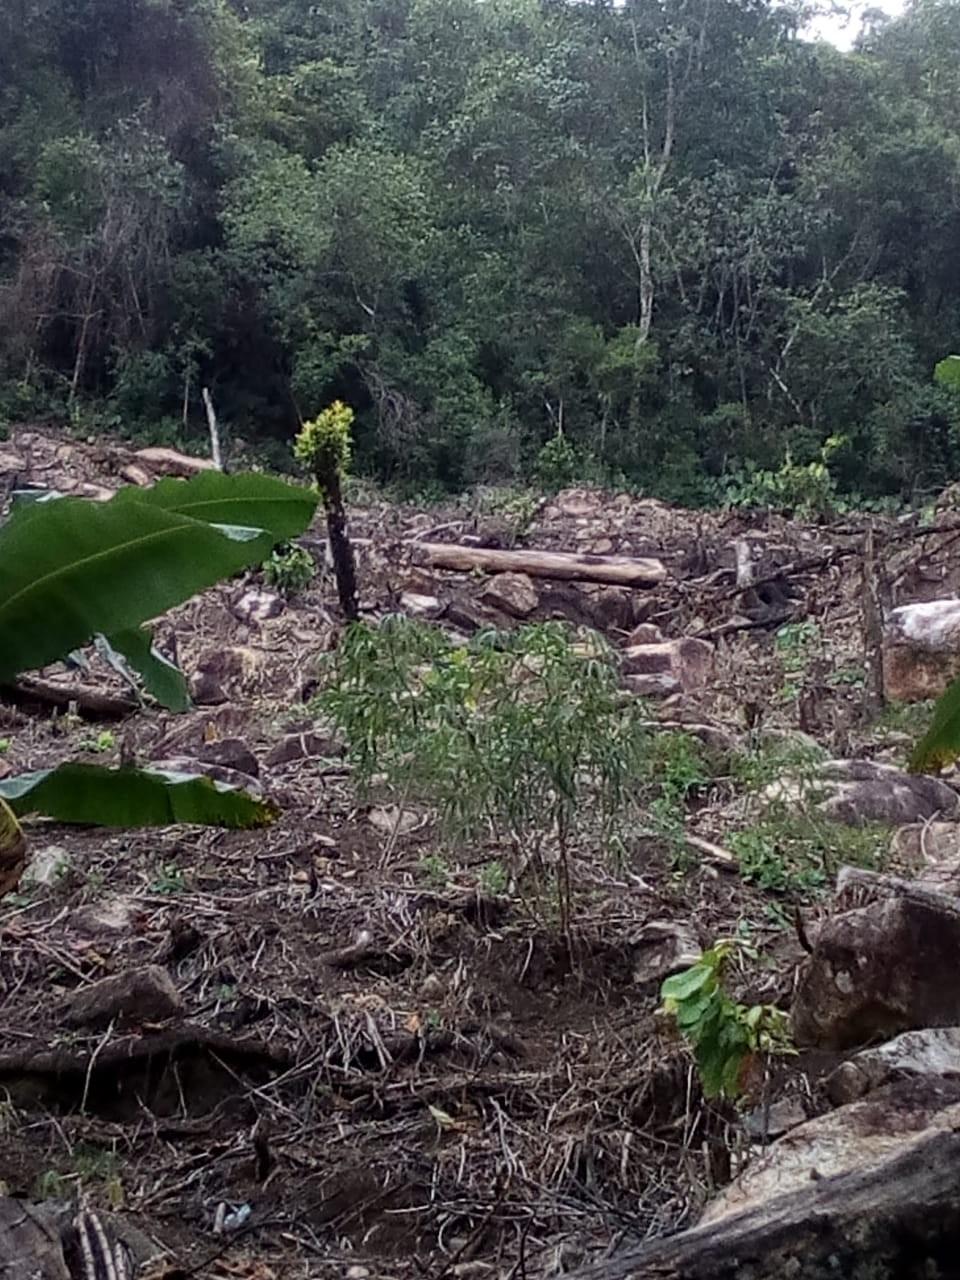 Arrasan bosque para vender lotes piratas en Ibagué